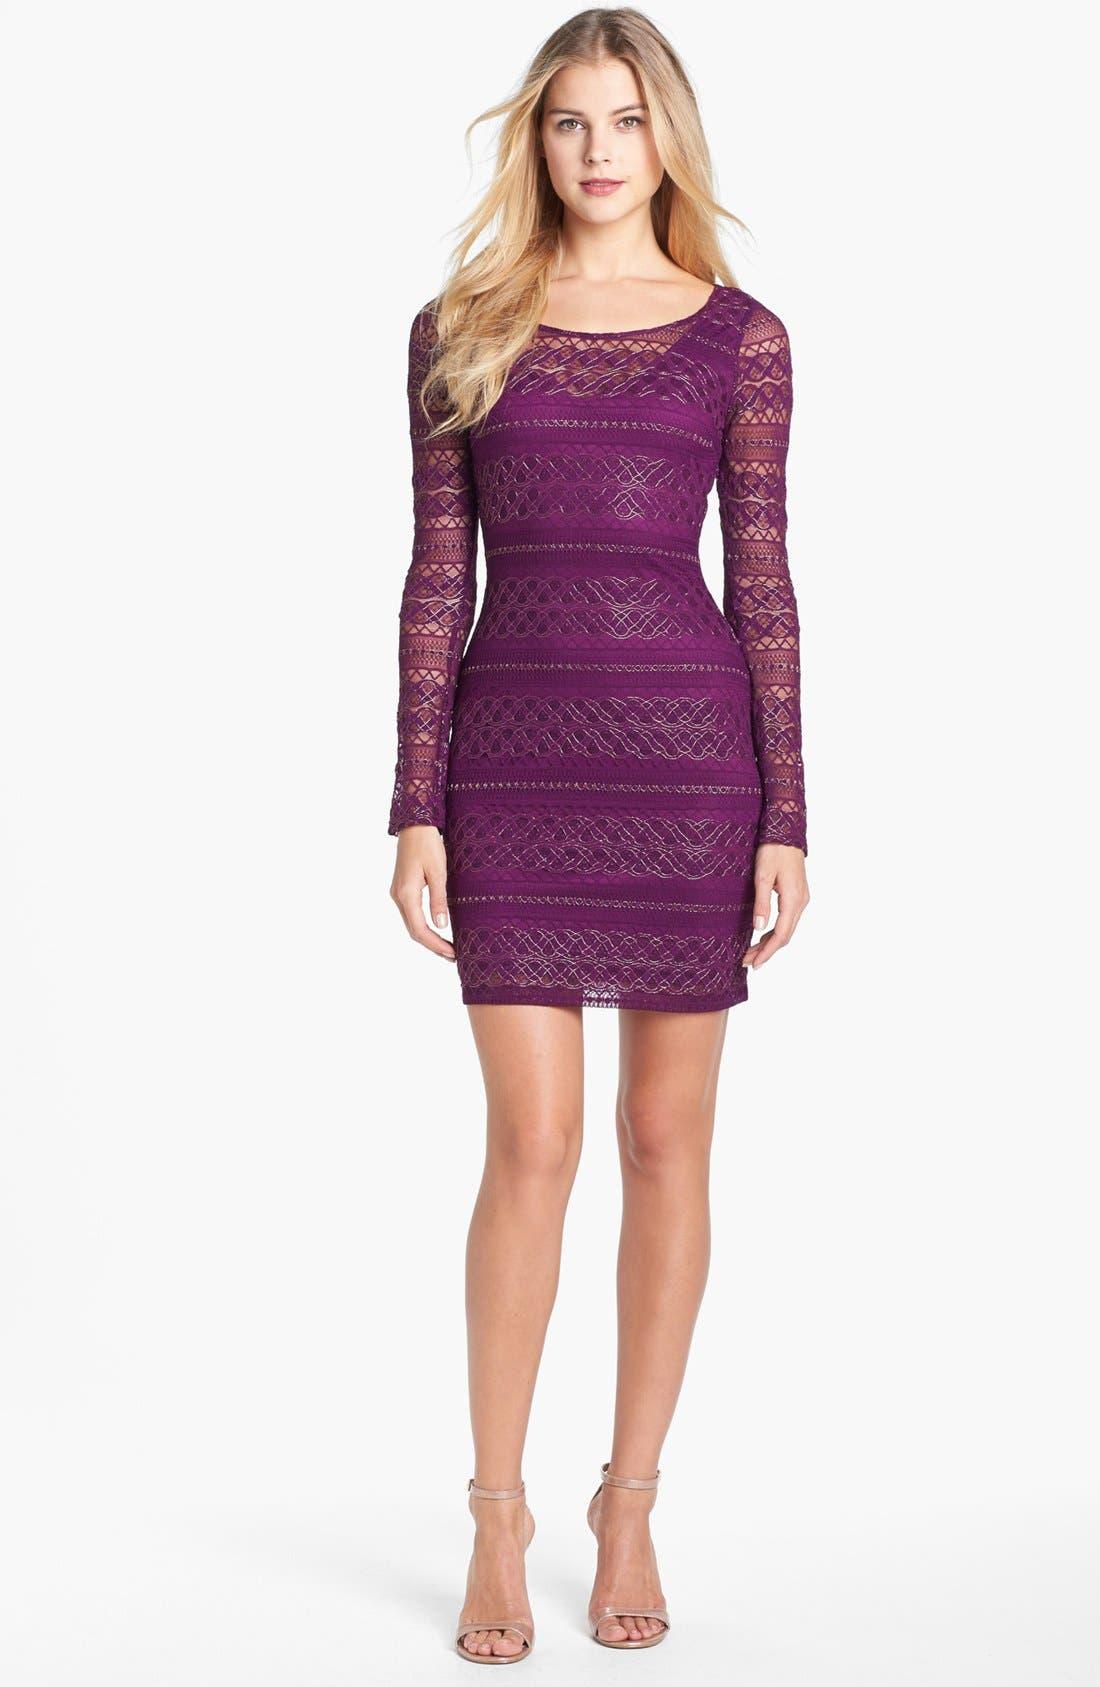 Alternate Image 1 Selected - GUESS Metallic Lace Knit Sheath Dress